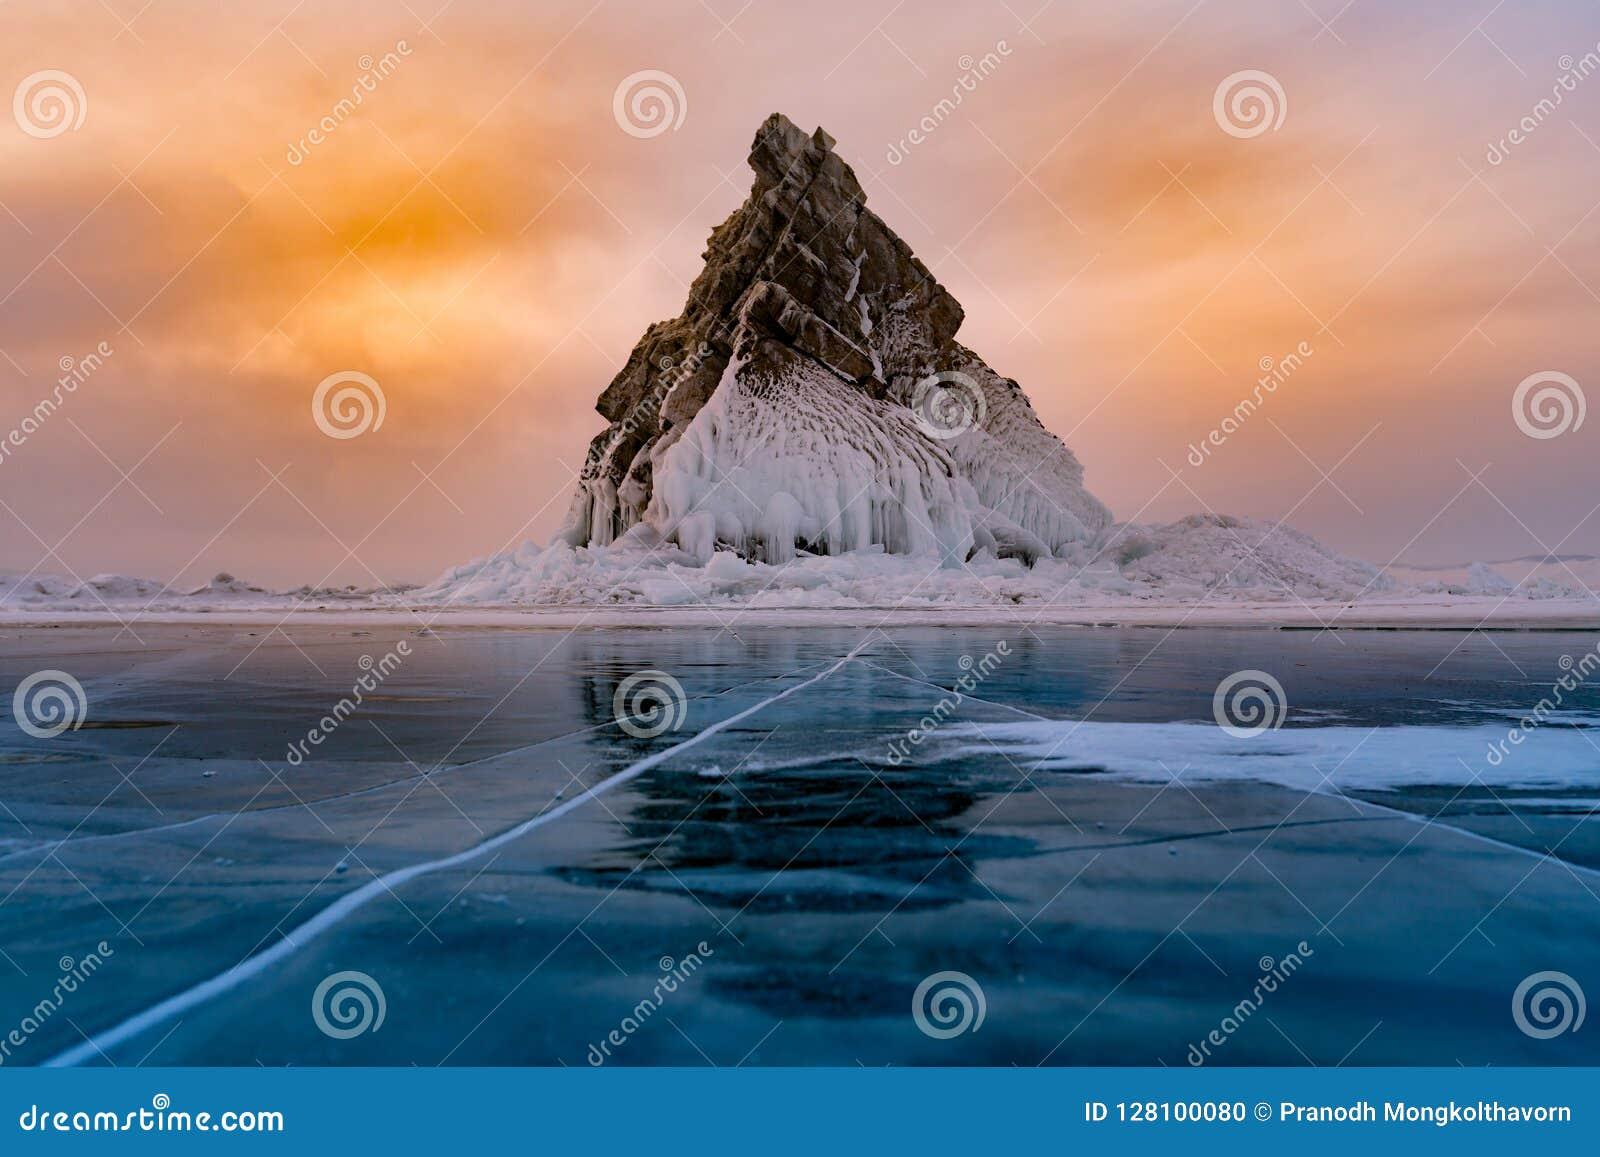 Rock on freeze water lake, Baikal Russia winter season